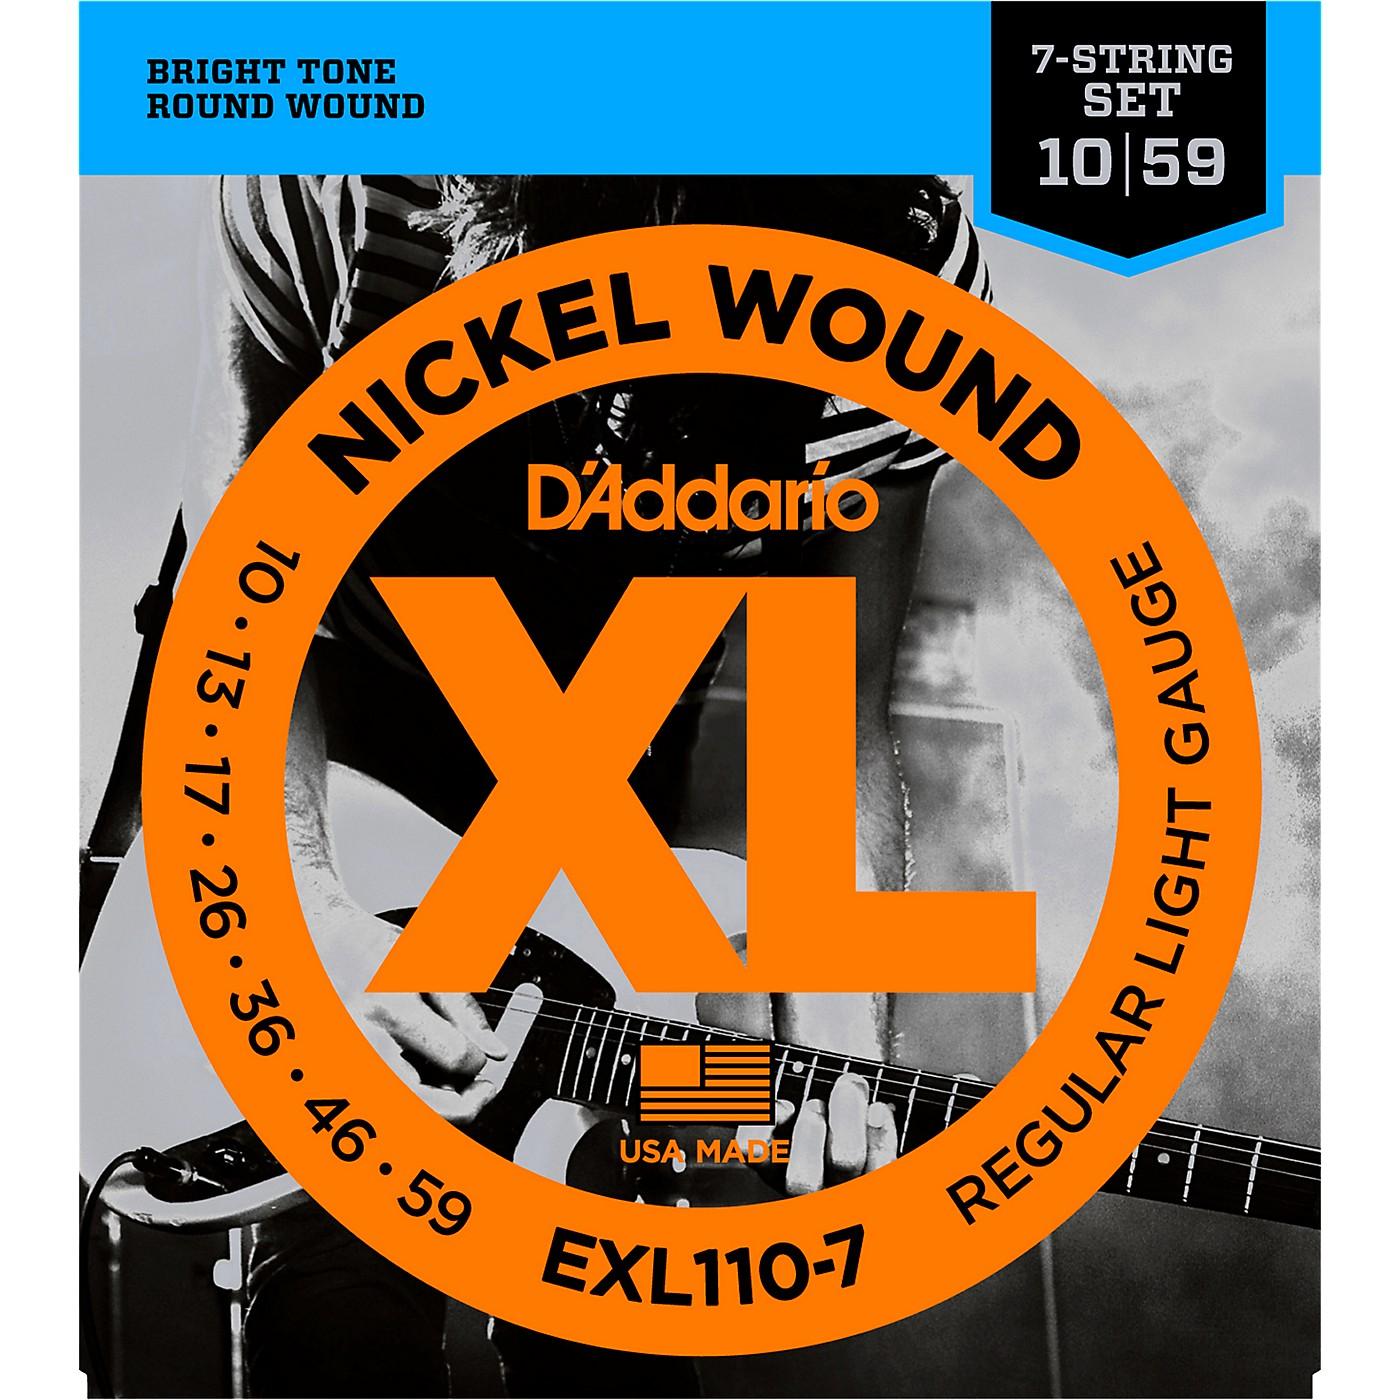 D'Addario EXL110-7 Lite 7-String Electric Guitar Strings thumbnail